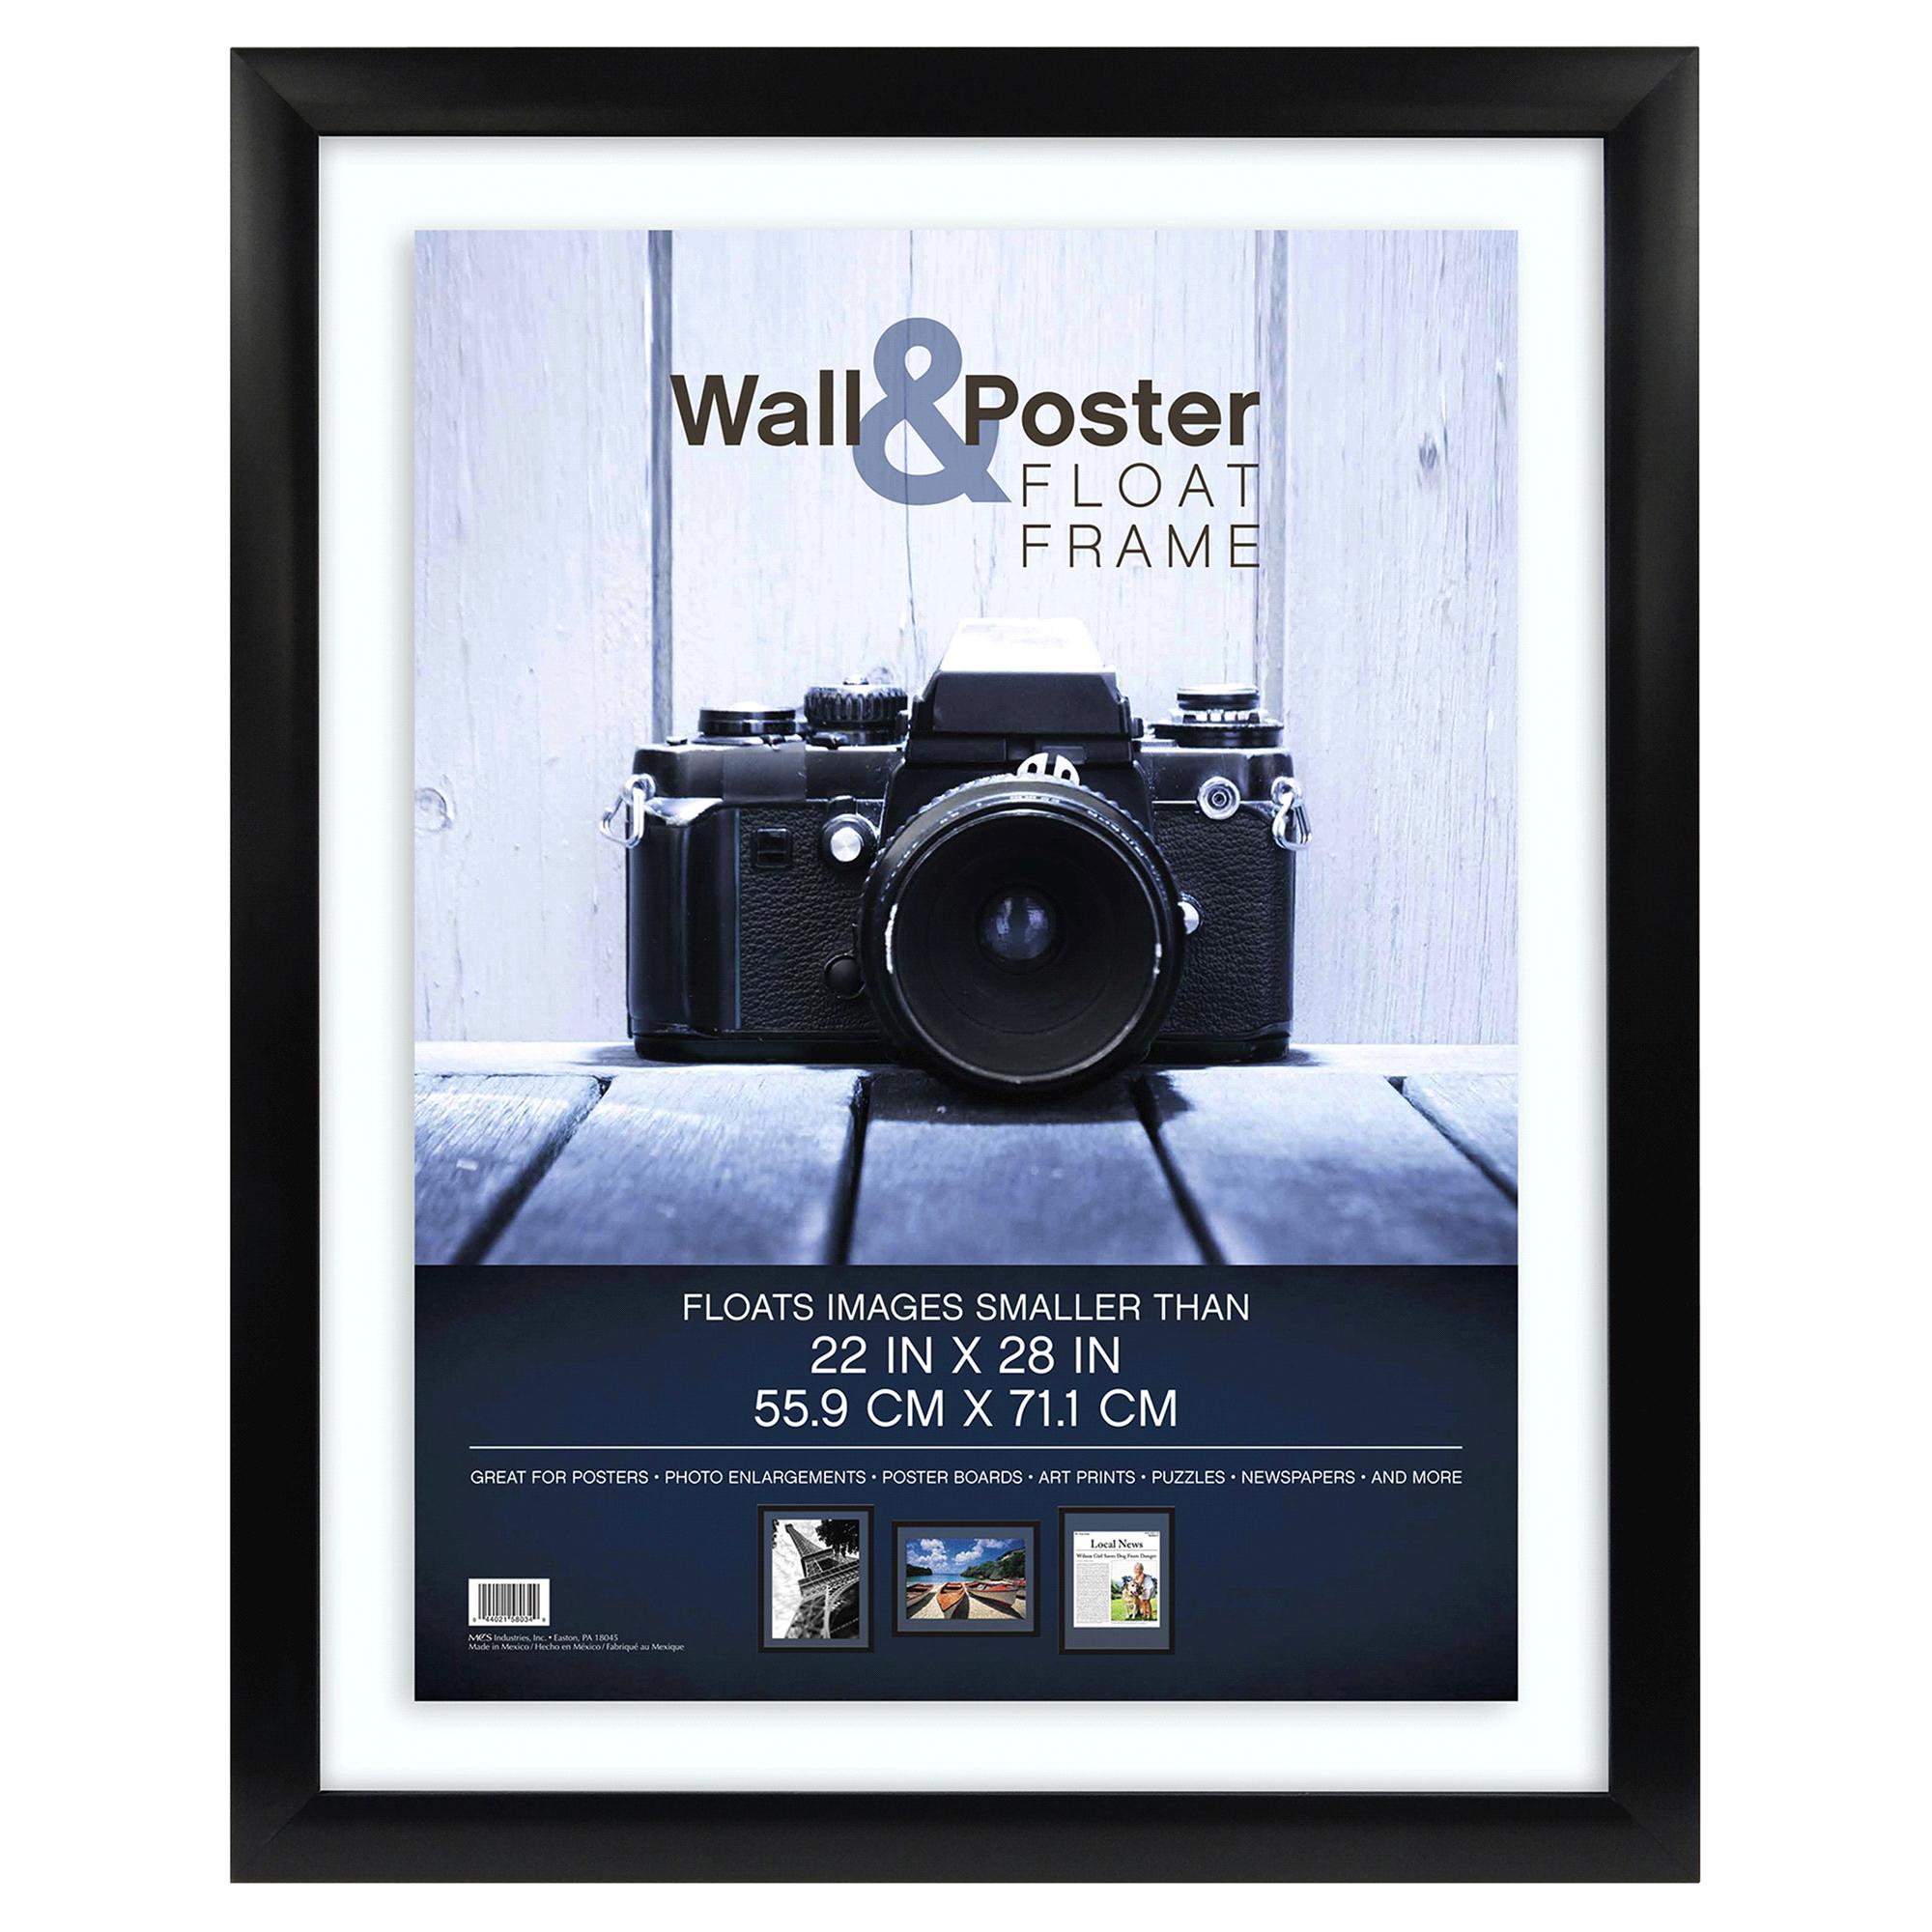 MCS Gallery Float Poster Frame - Black - 22 x 28 | Meijer.com